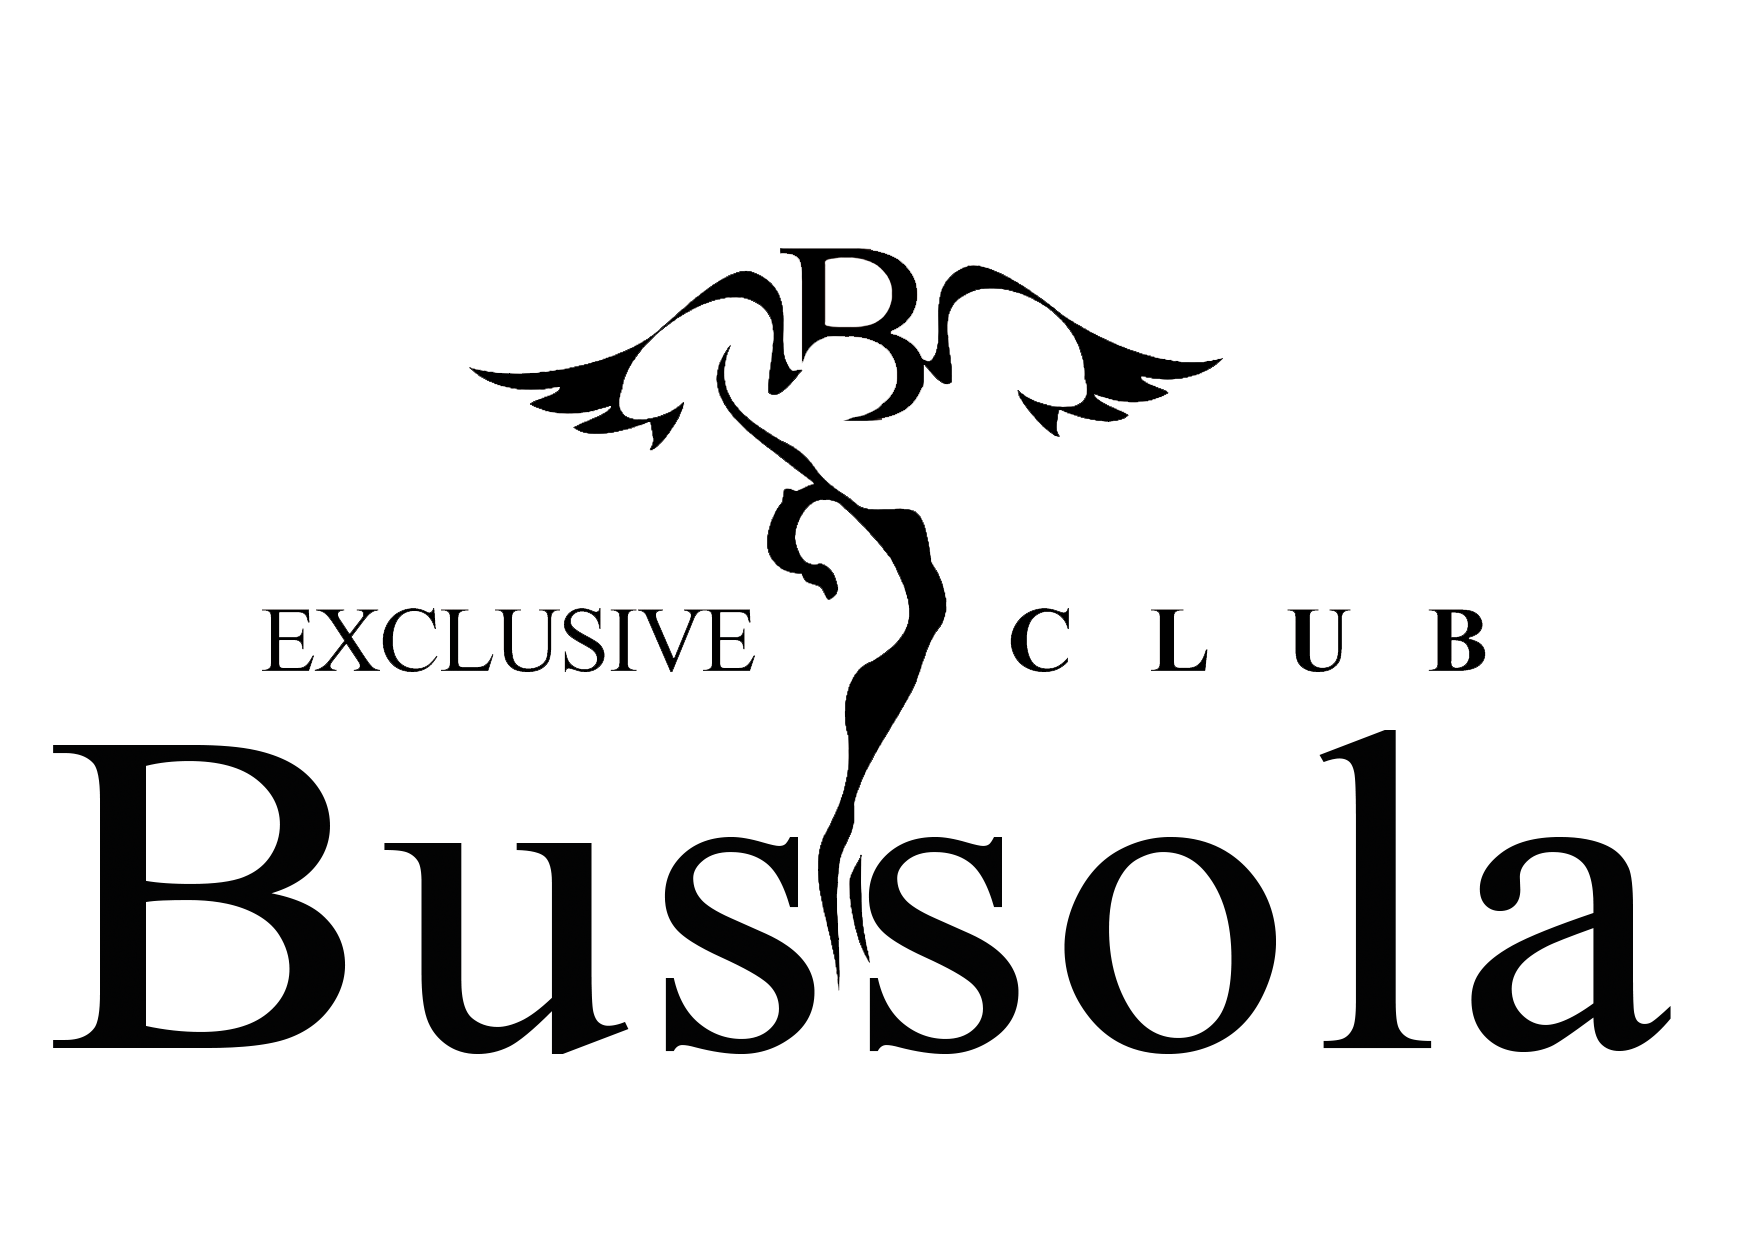 logo-bussola-club-nero